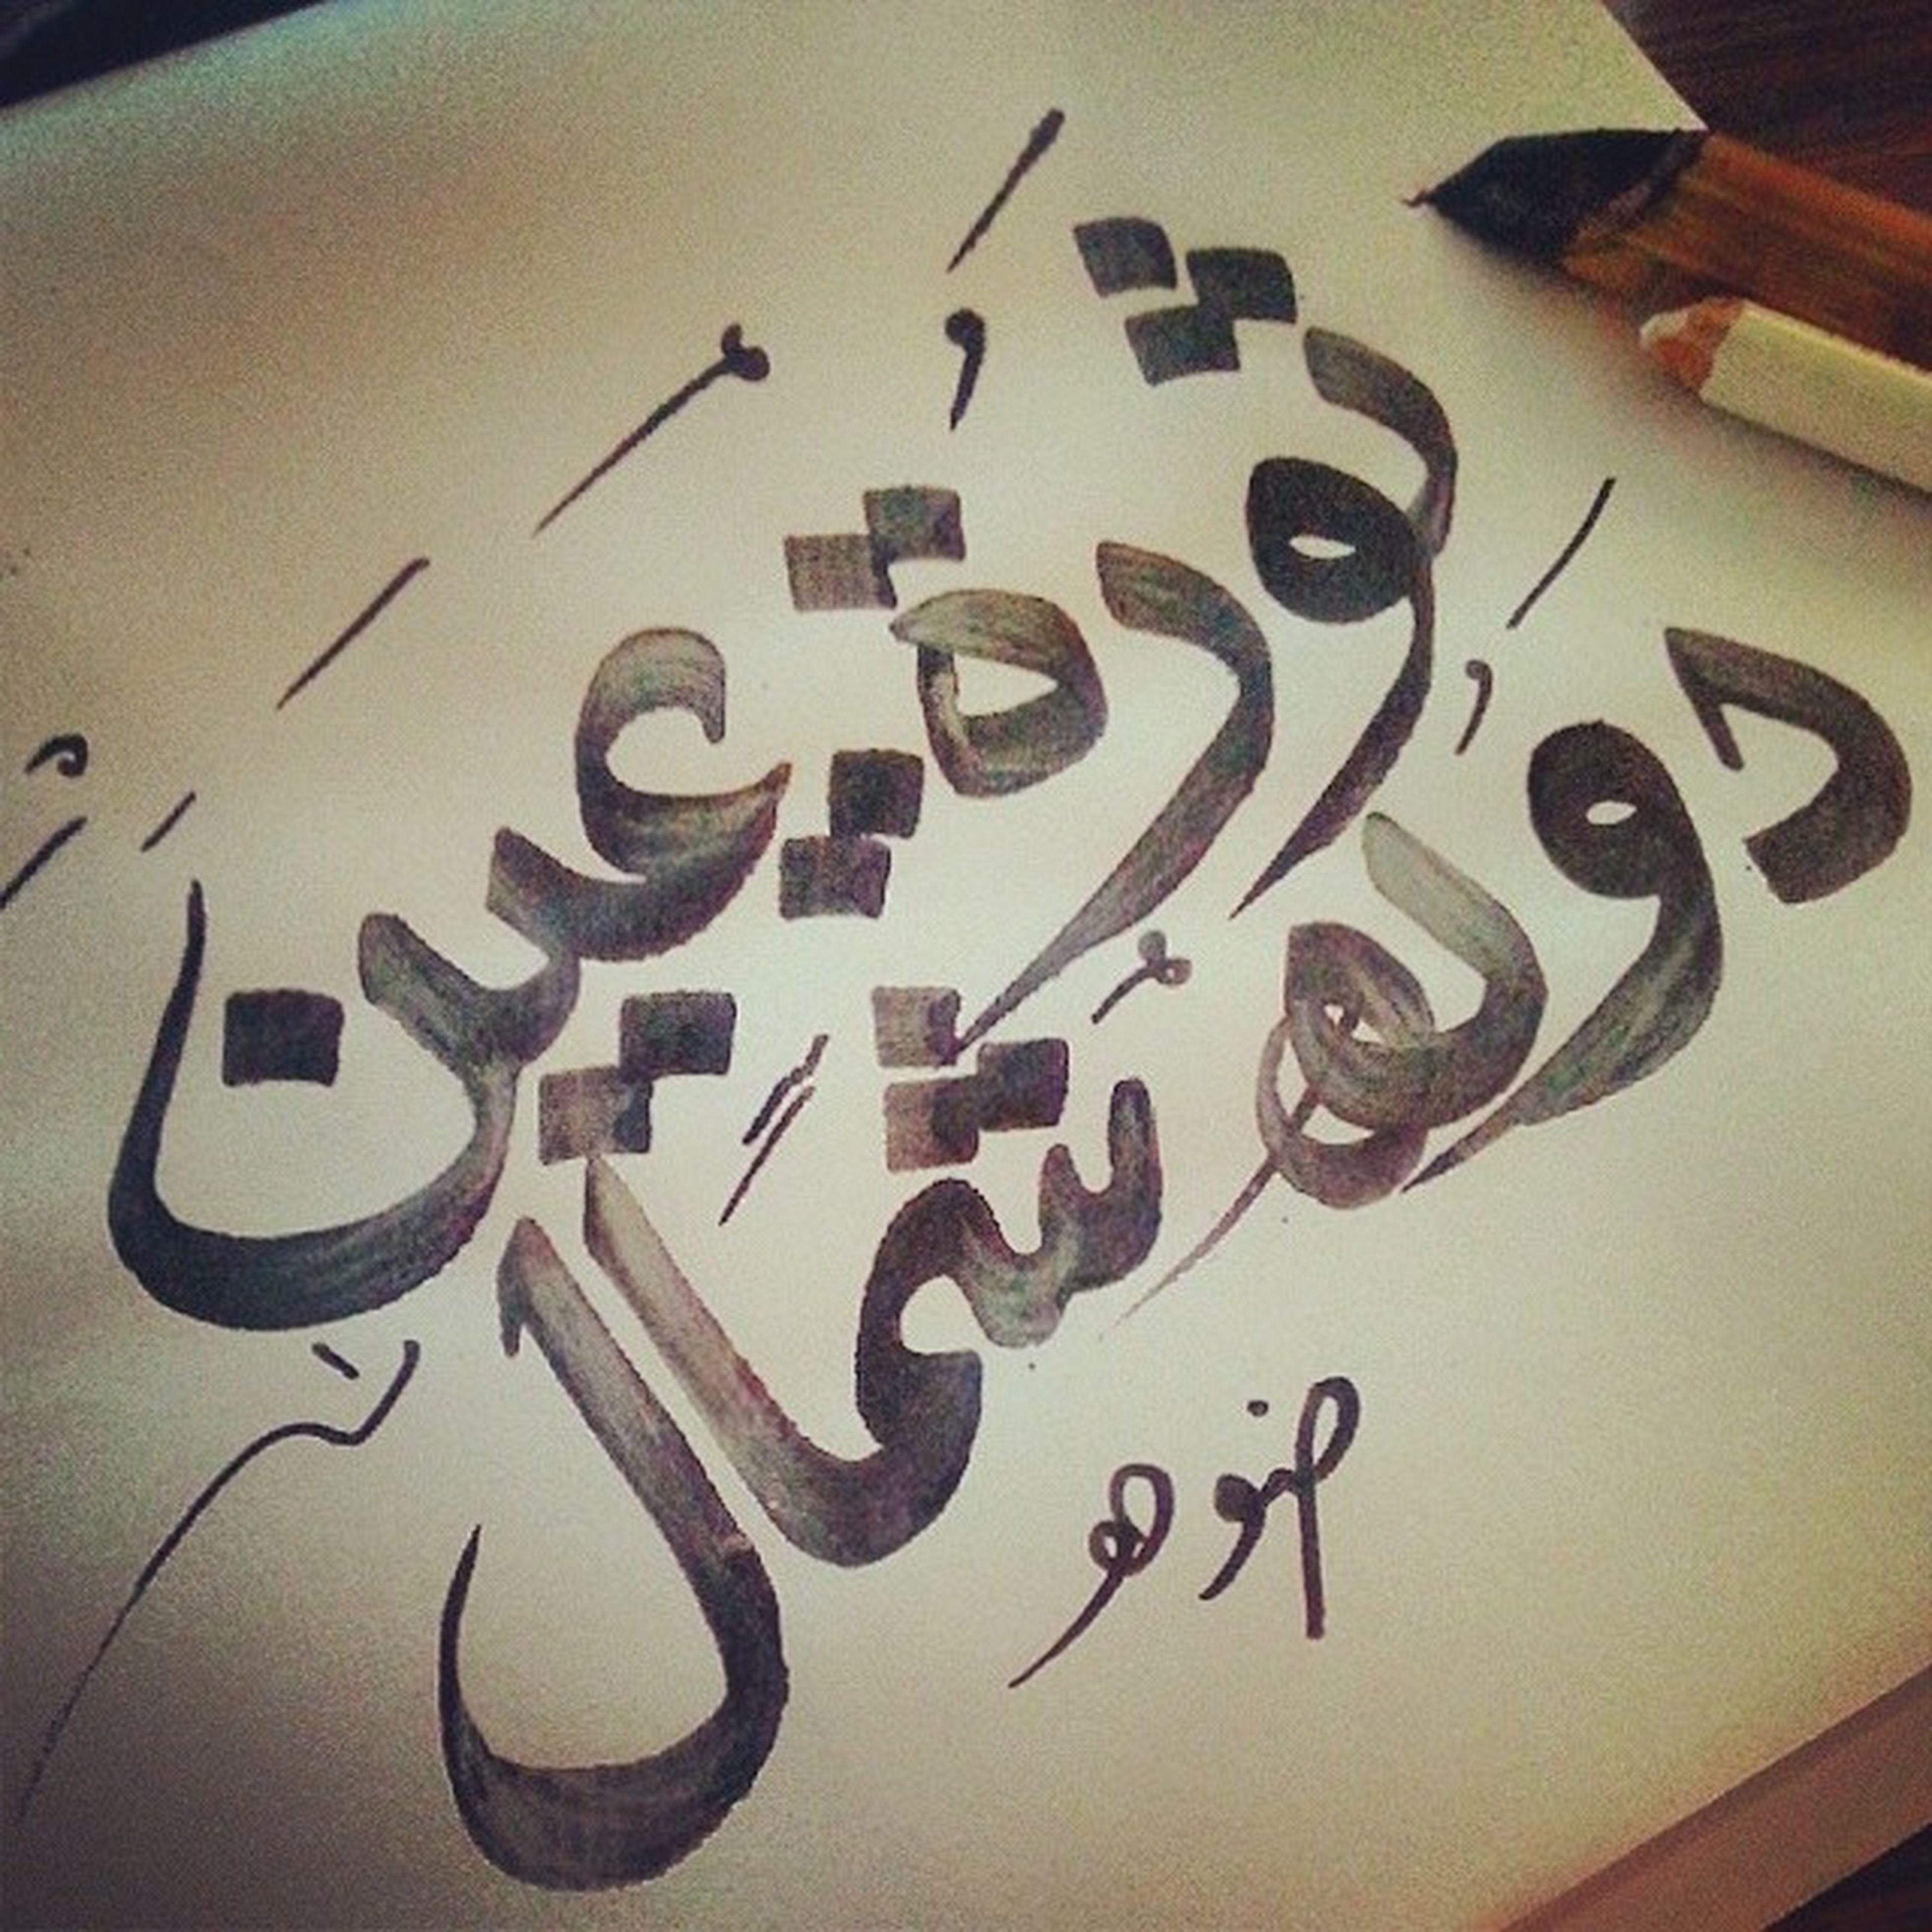 دولة شمال Typo by : Dawa Words by : Teleb